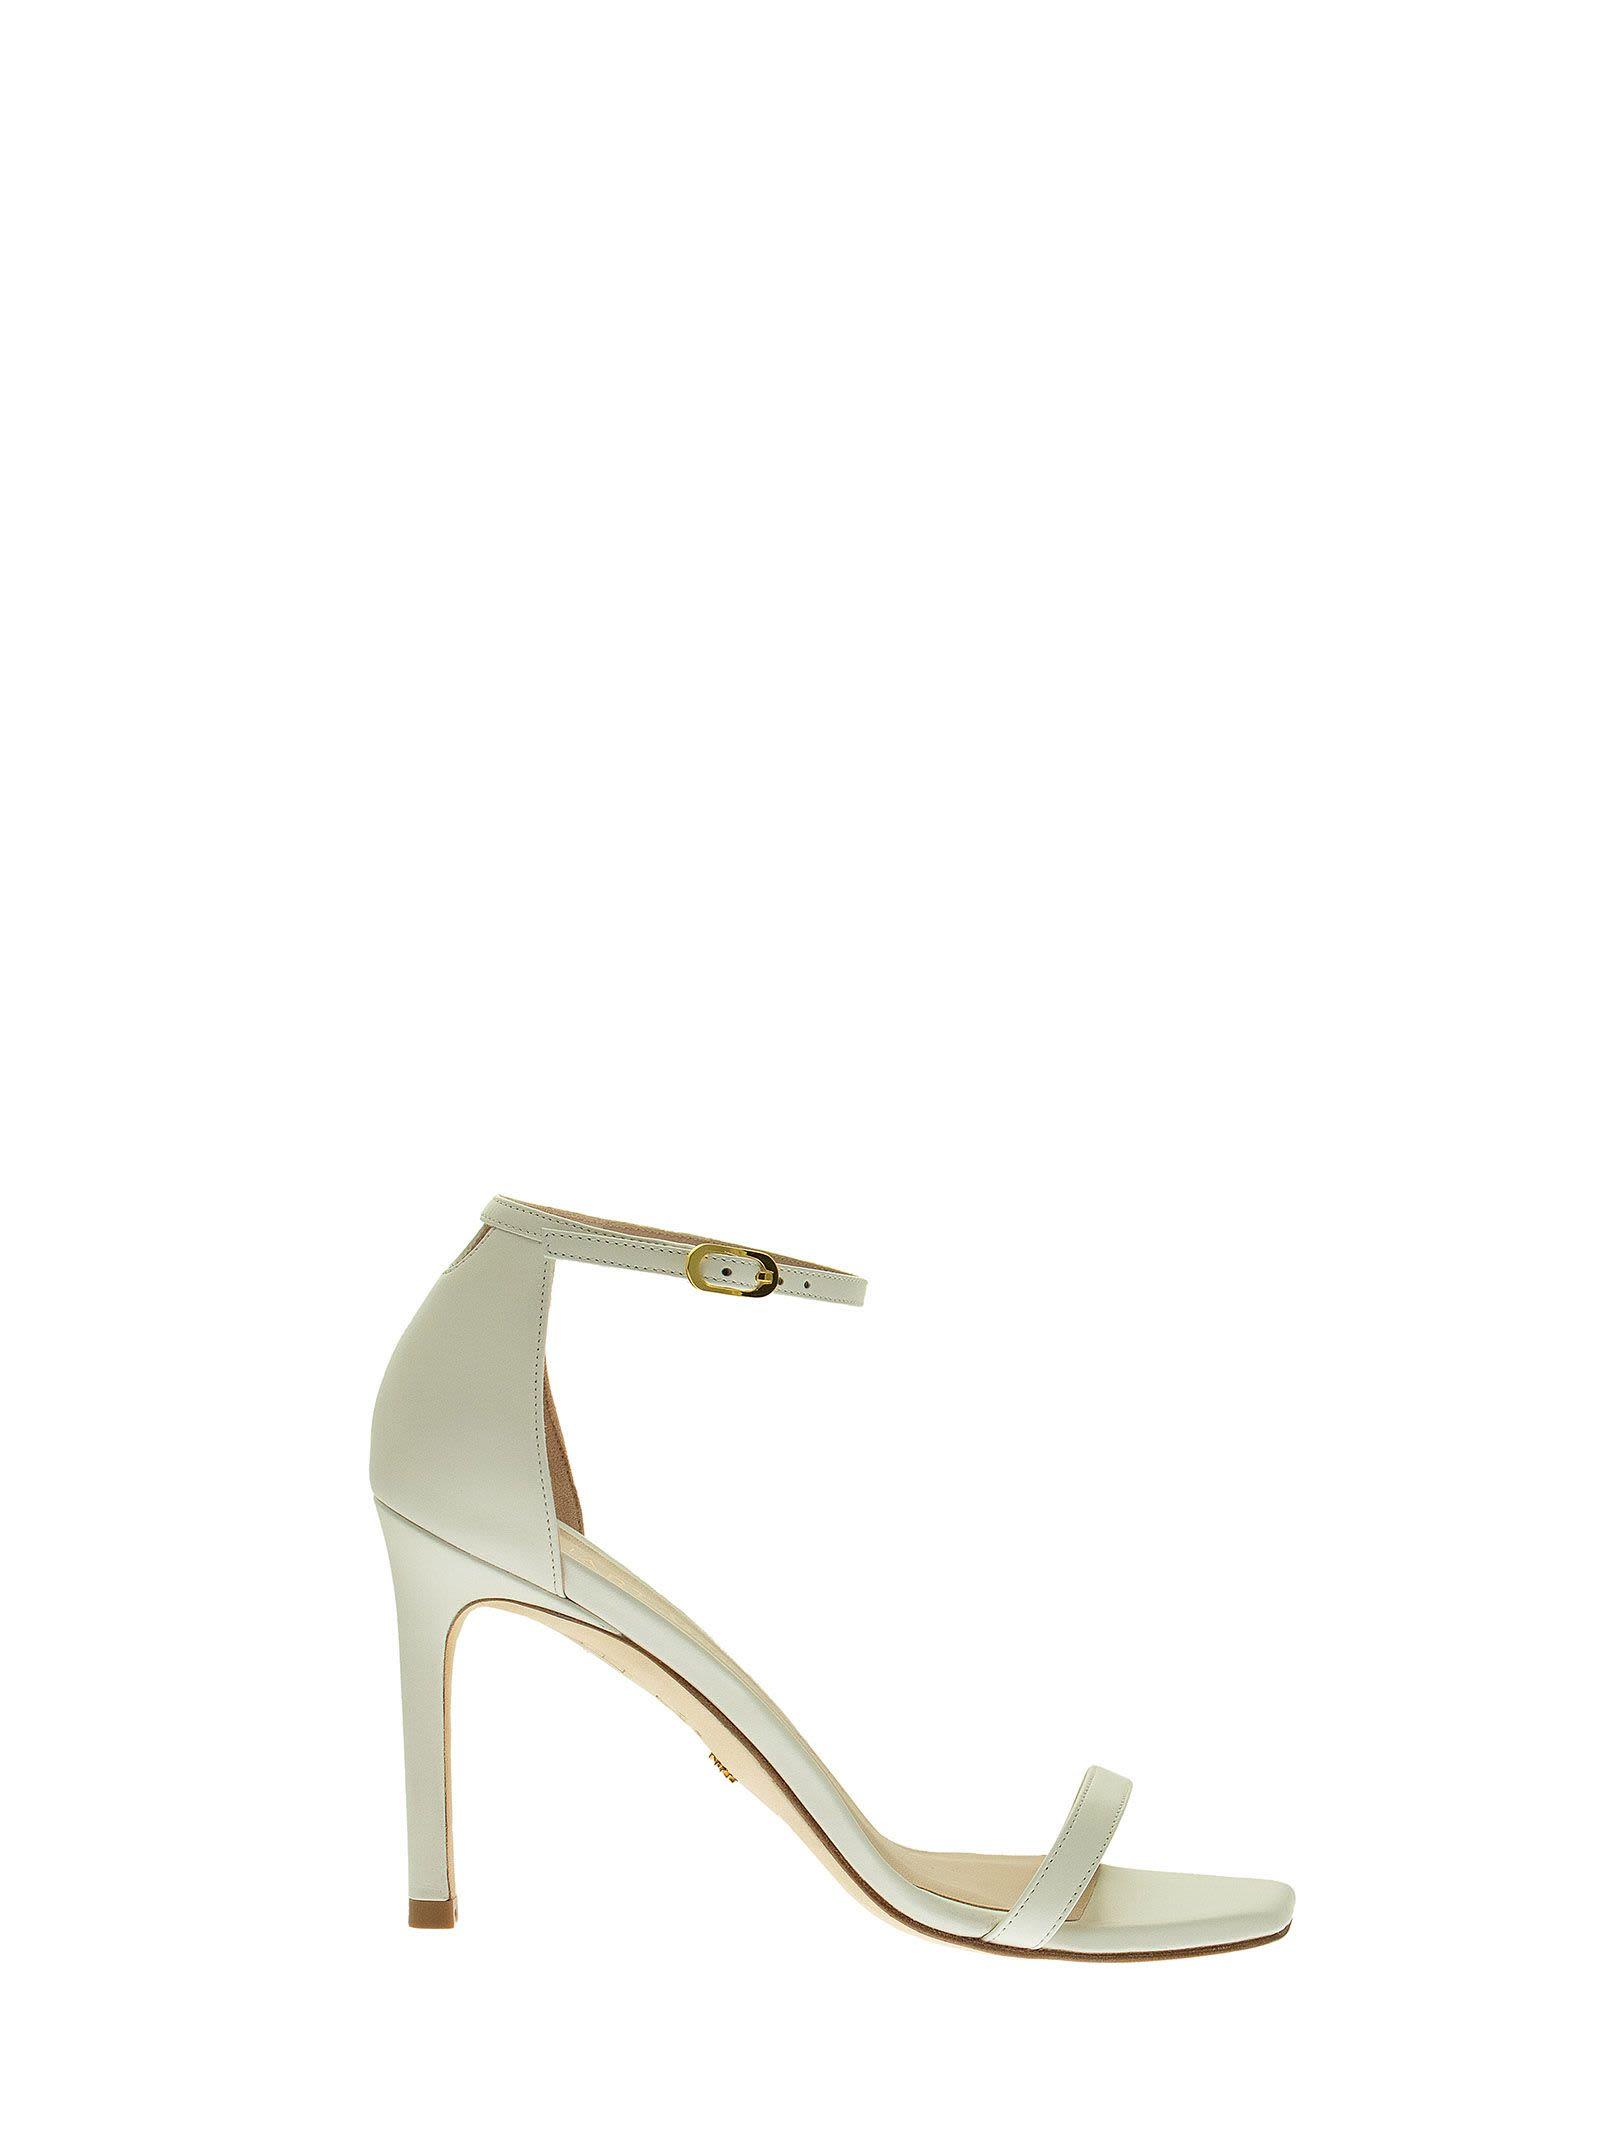 Buy Stuart Weitzman Amelina 95 - Heeled Sandal online, shop Stuart Weitzman shoes with free shipping